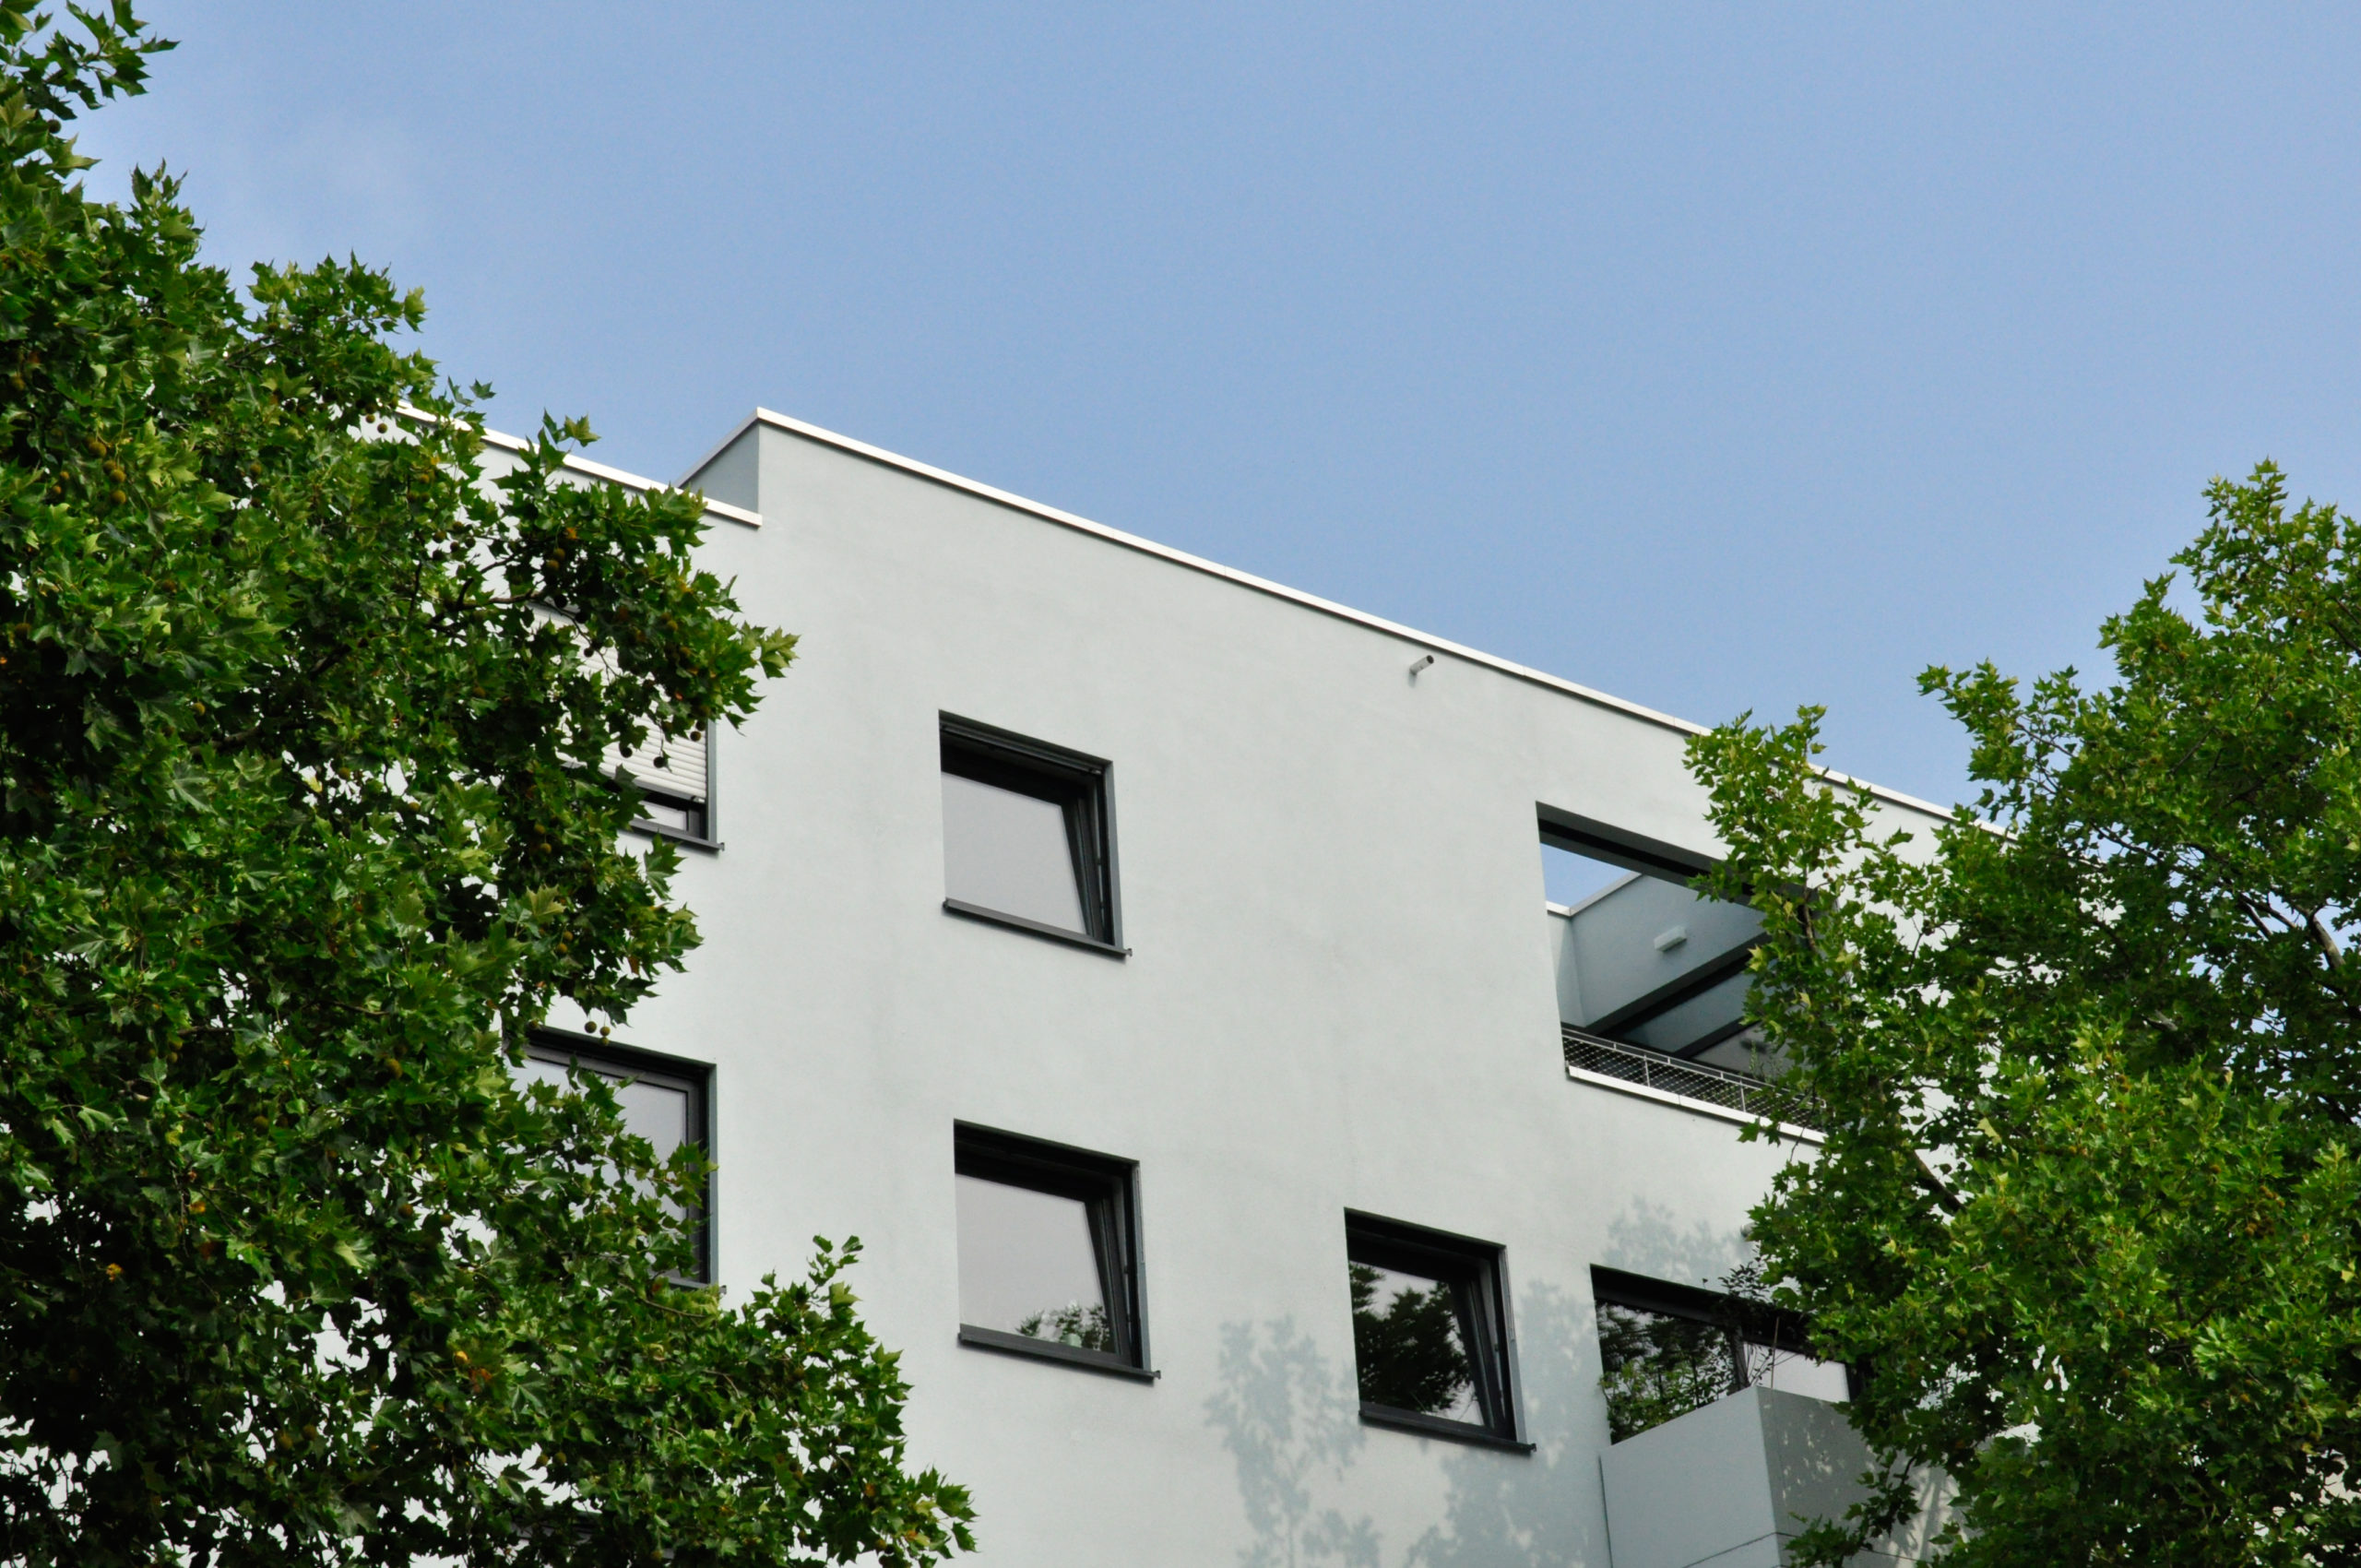 HSK76_SteinwegClausArchitekten_Molestina_Mehrfamilienhaus_Loft_Koeln_00010